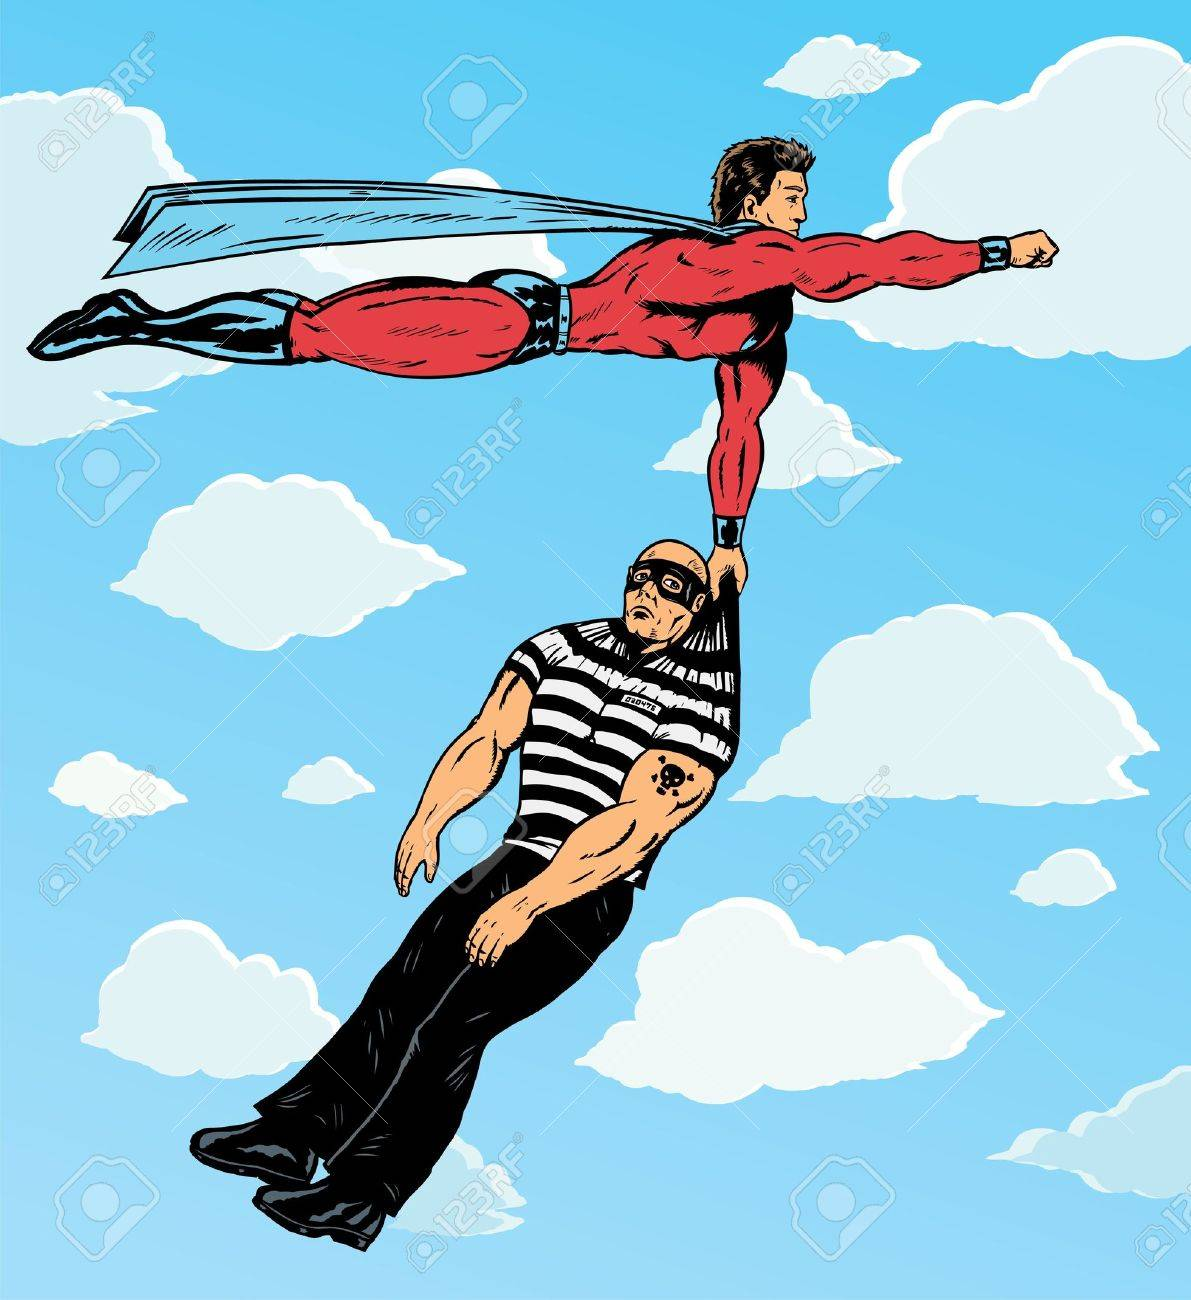 Superhero capturing villain. Stock Vector - 20342457